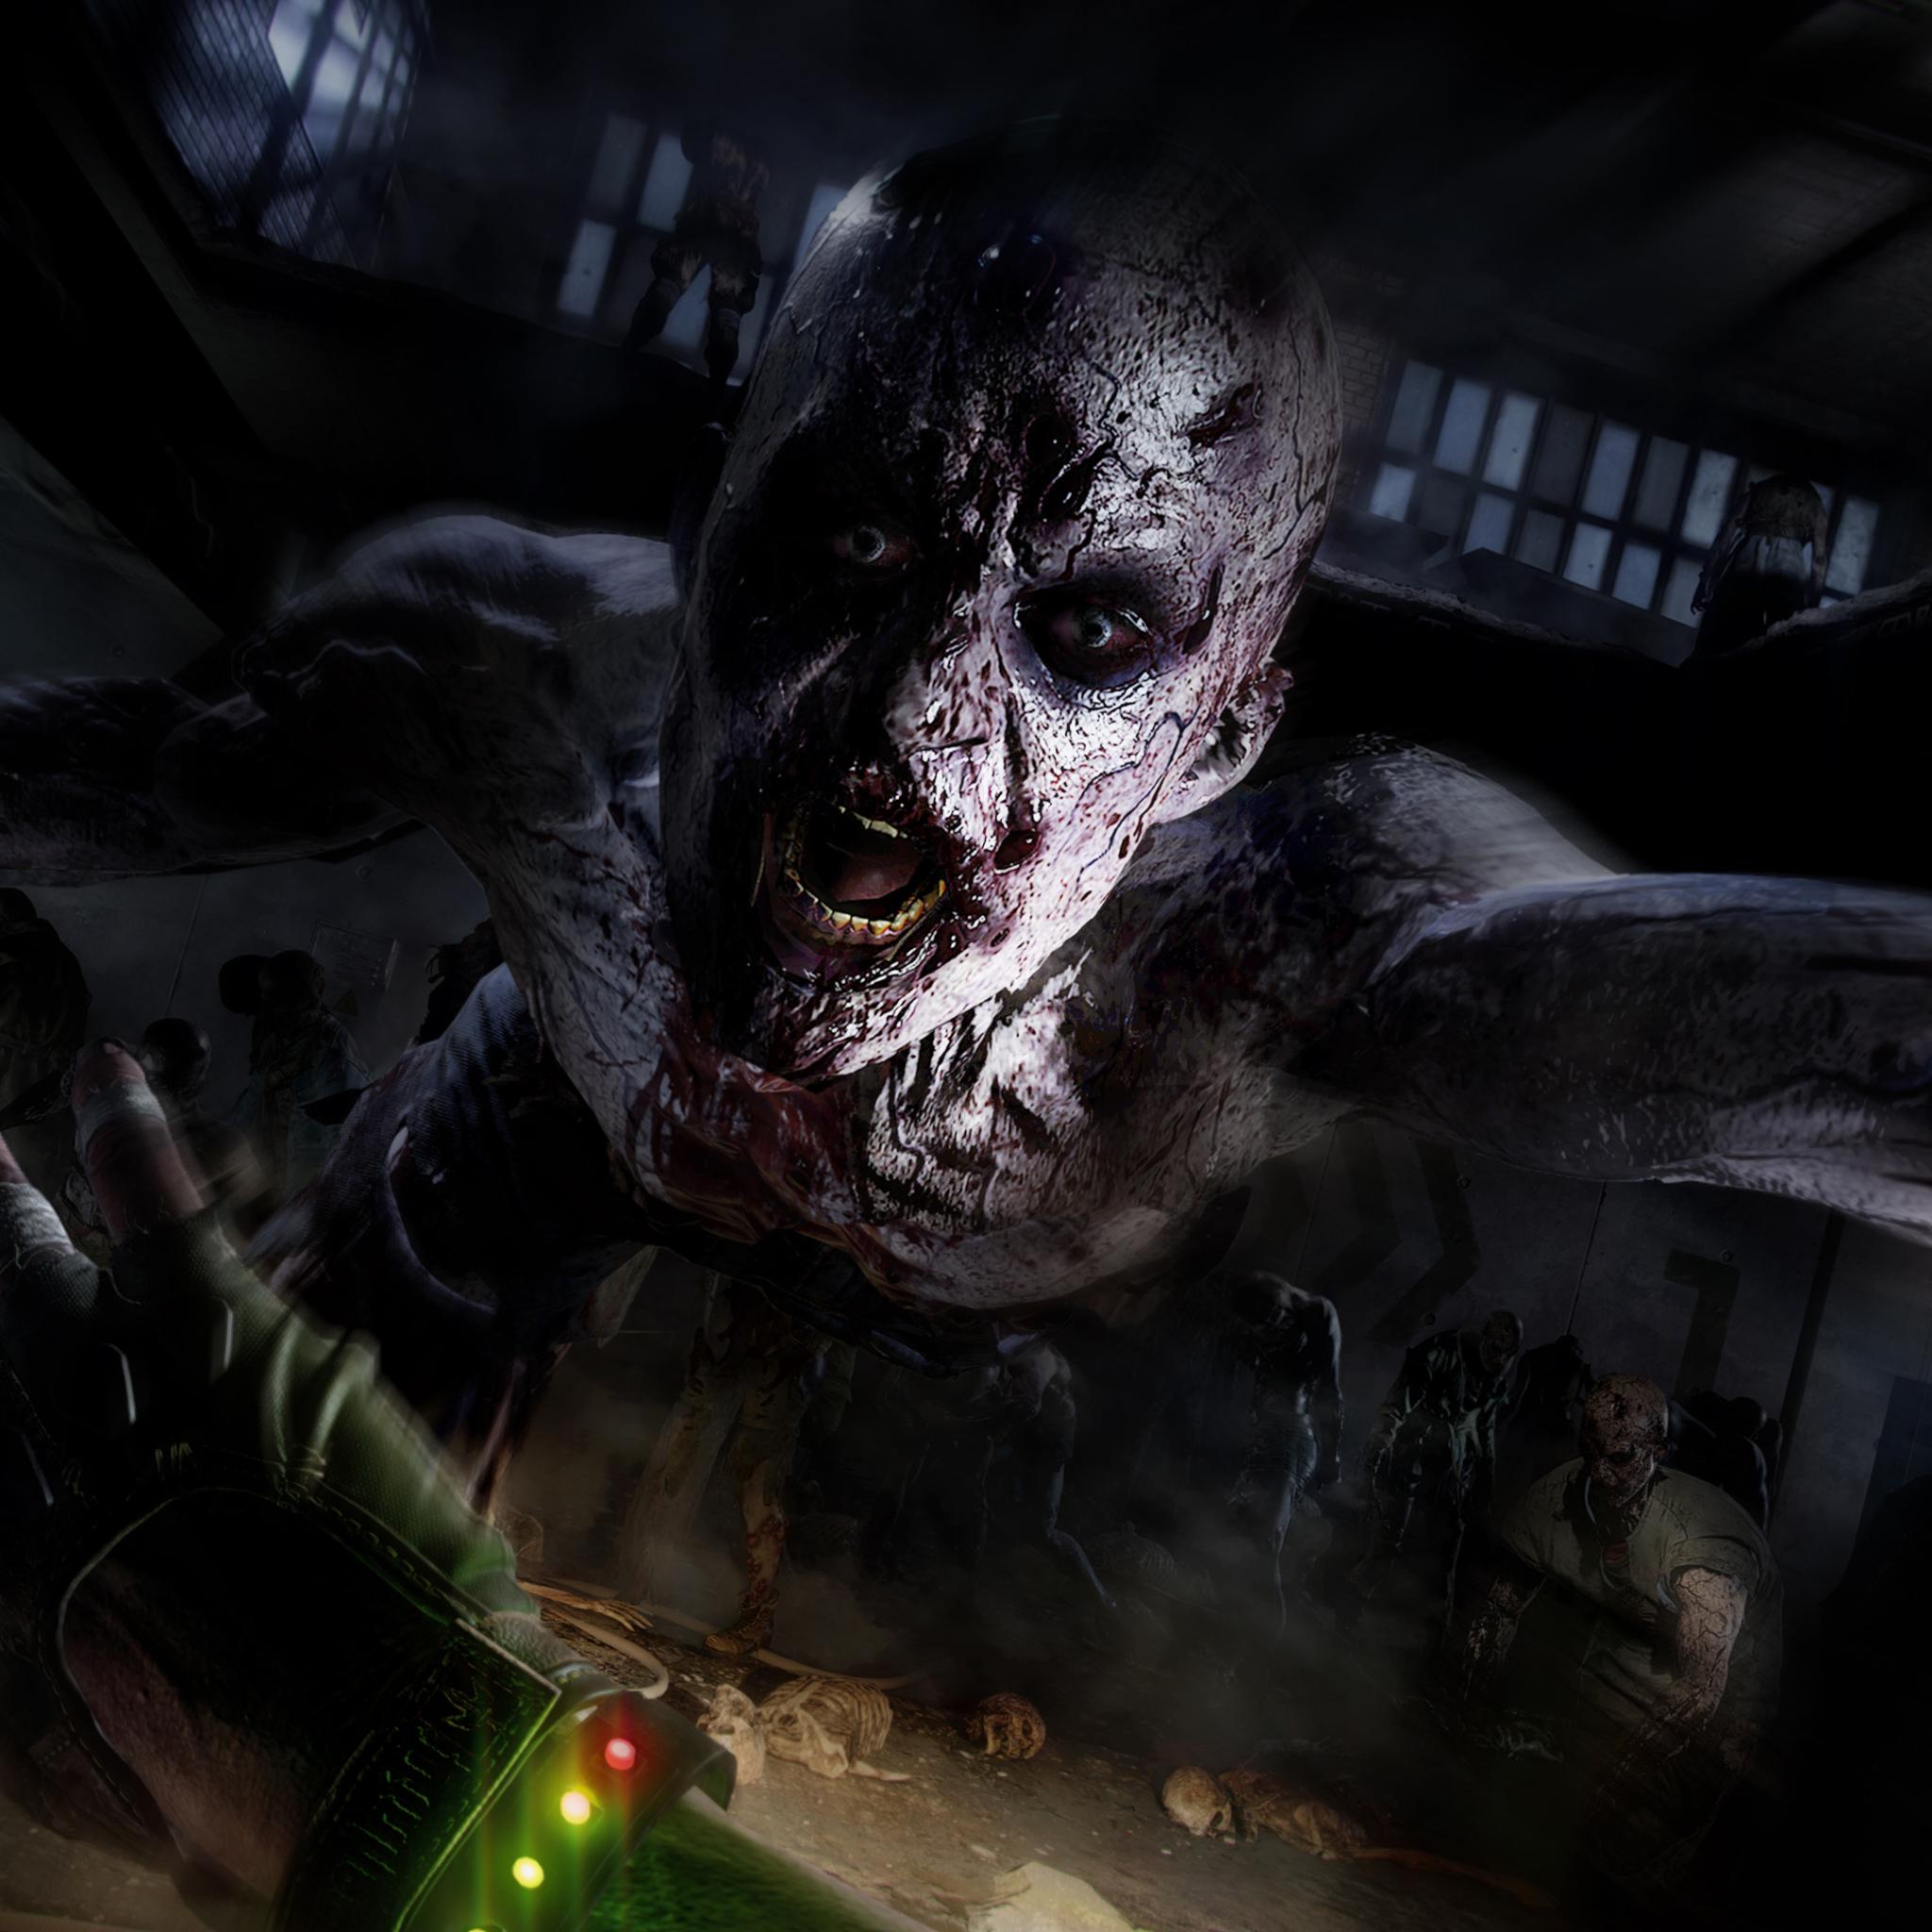 2048x2048 Dying Light 2 Game Ipad Air Wallpaper Hd Games 4k